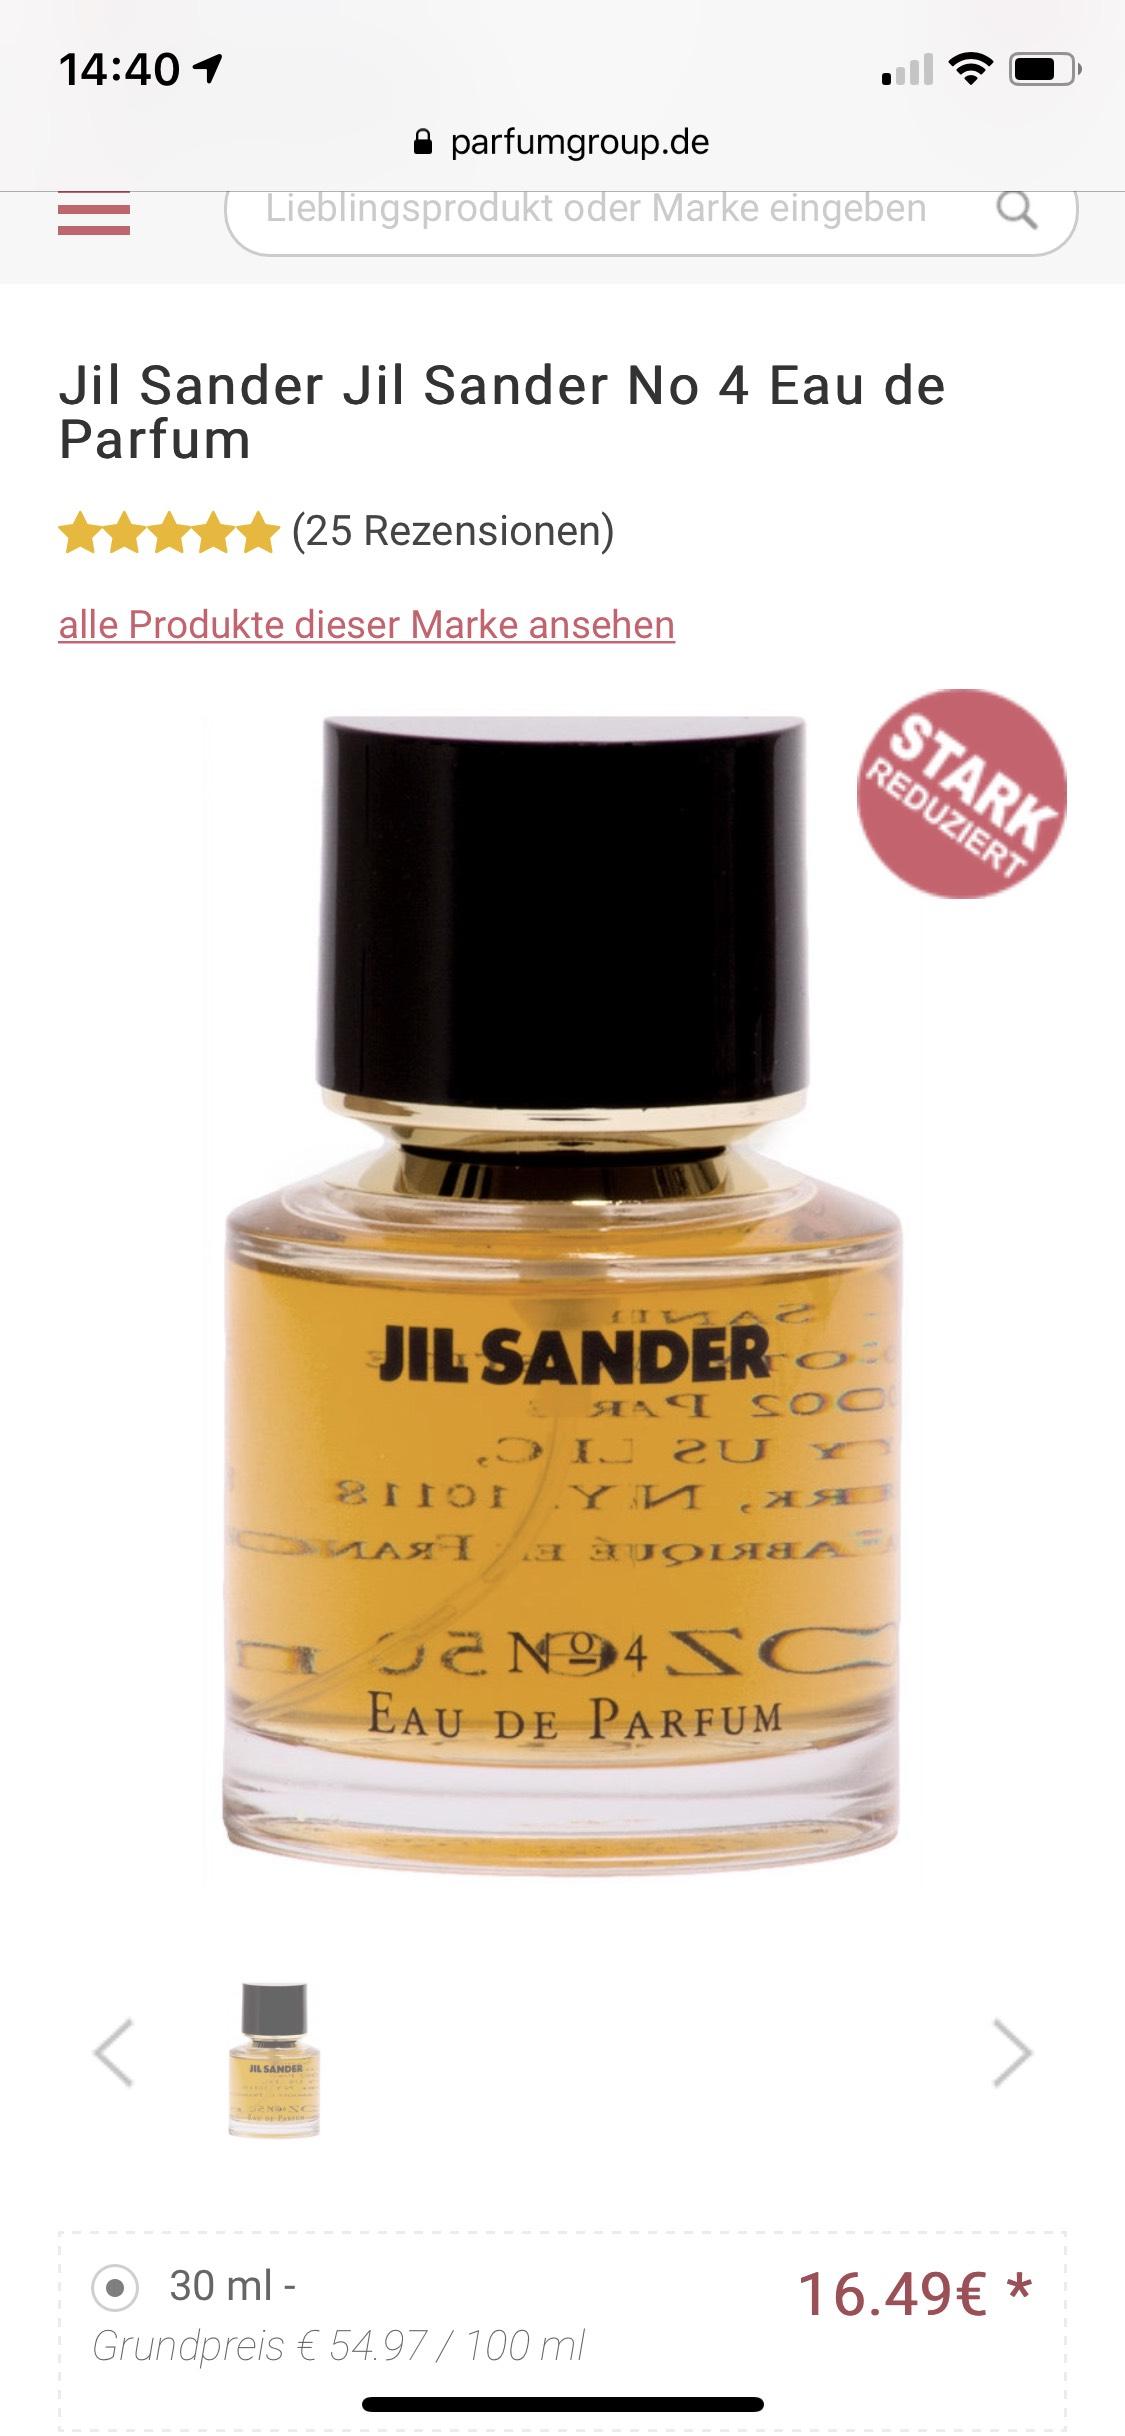 Jil Sander Jil Sander No 4 Eau de Parfum 30ml